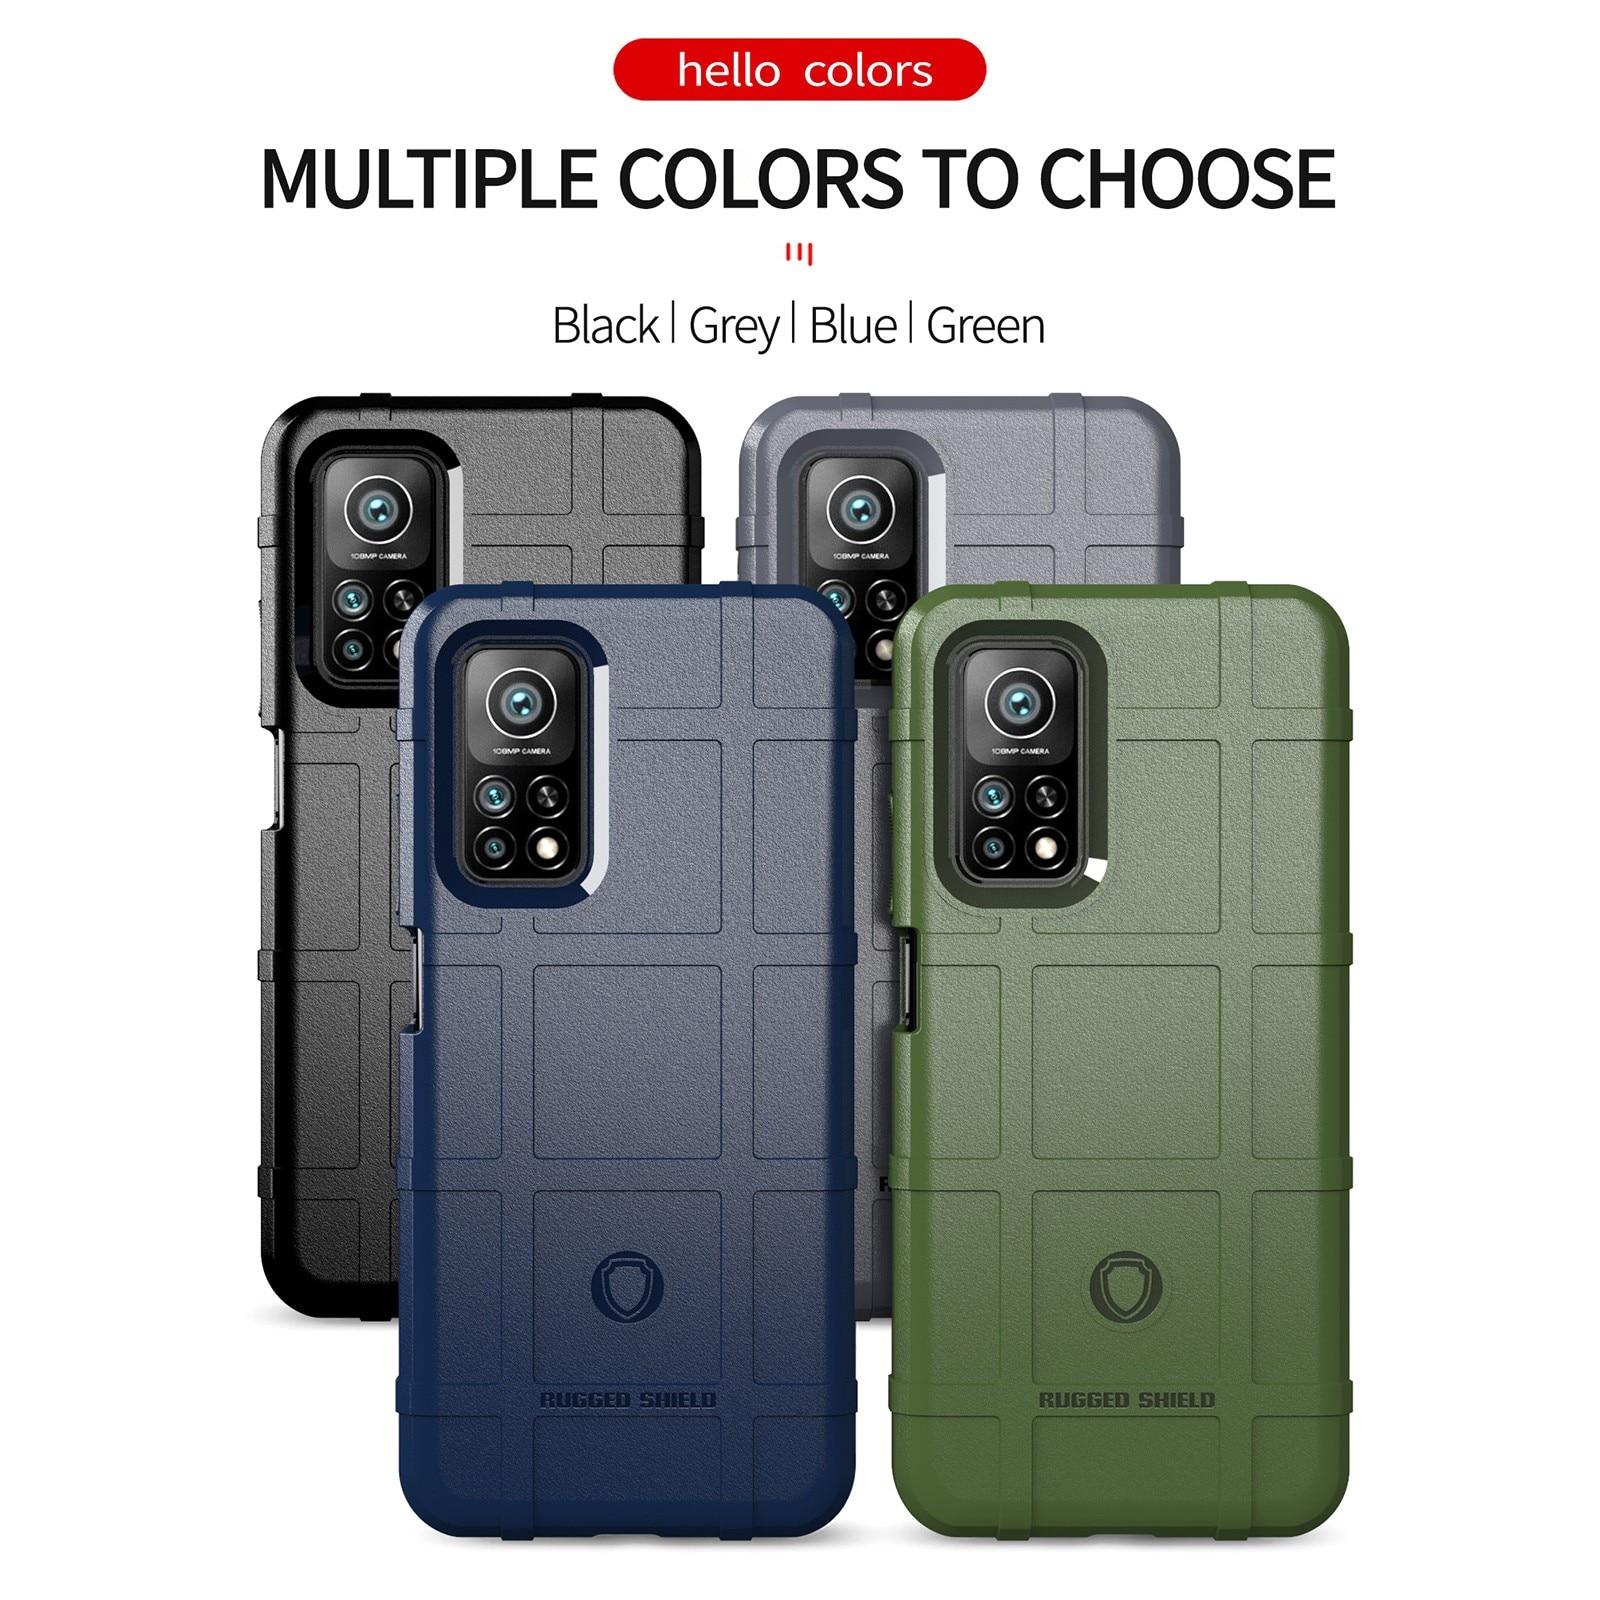 Mi 10t pro 5g cor vidro temperado caso para xiaomi caso do telefone móvel 6.67 Polegada silm telefone volta capa anti-queda para mi 10t pro